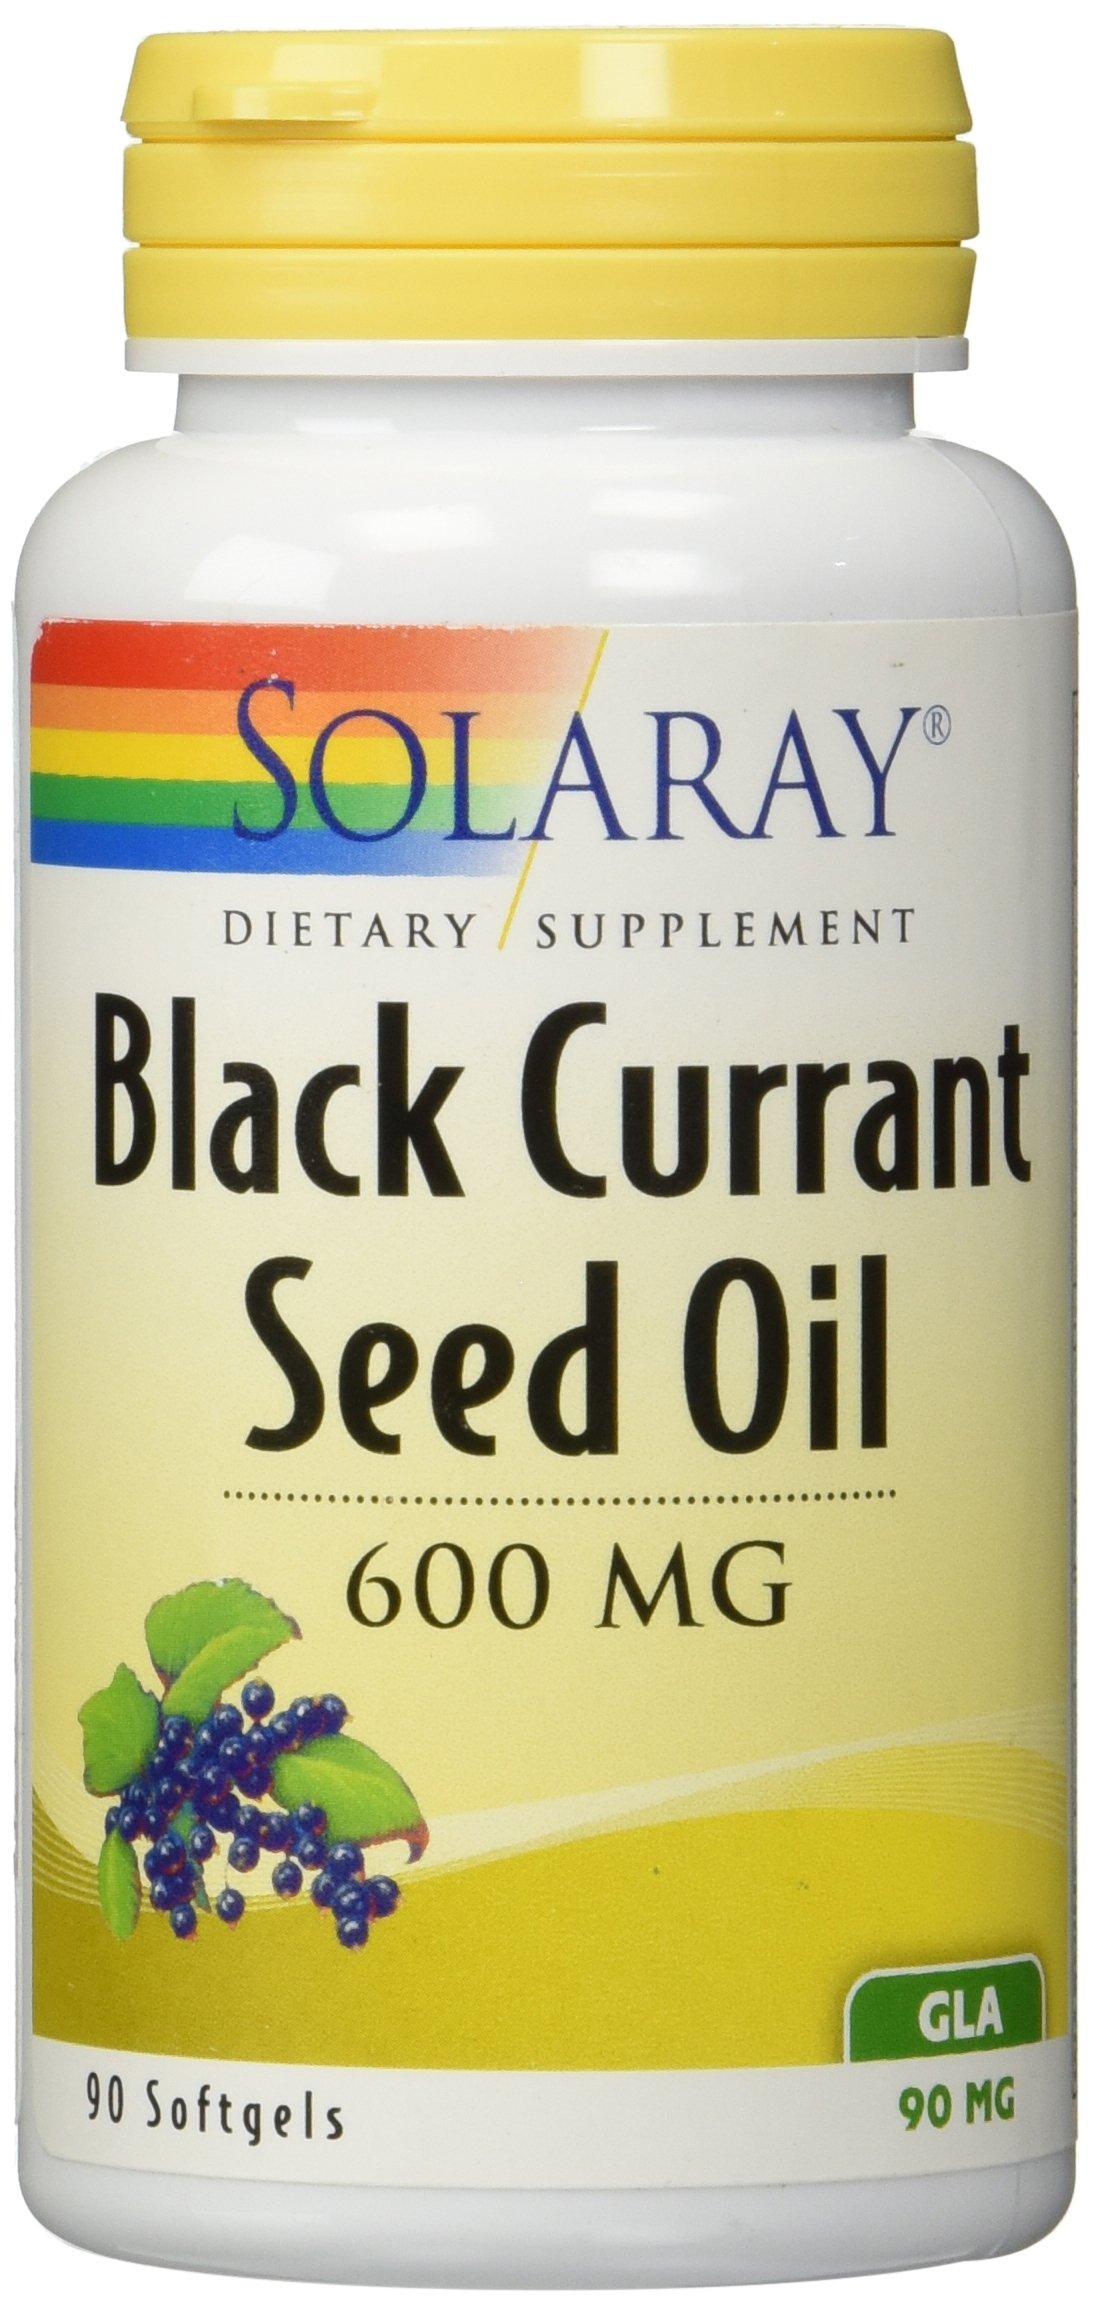 Solaray Black Currant Seed Oil, 600 Mg, 90 Softgels